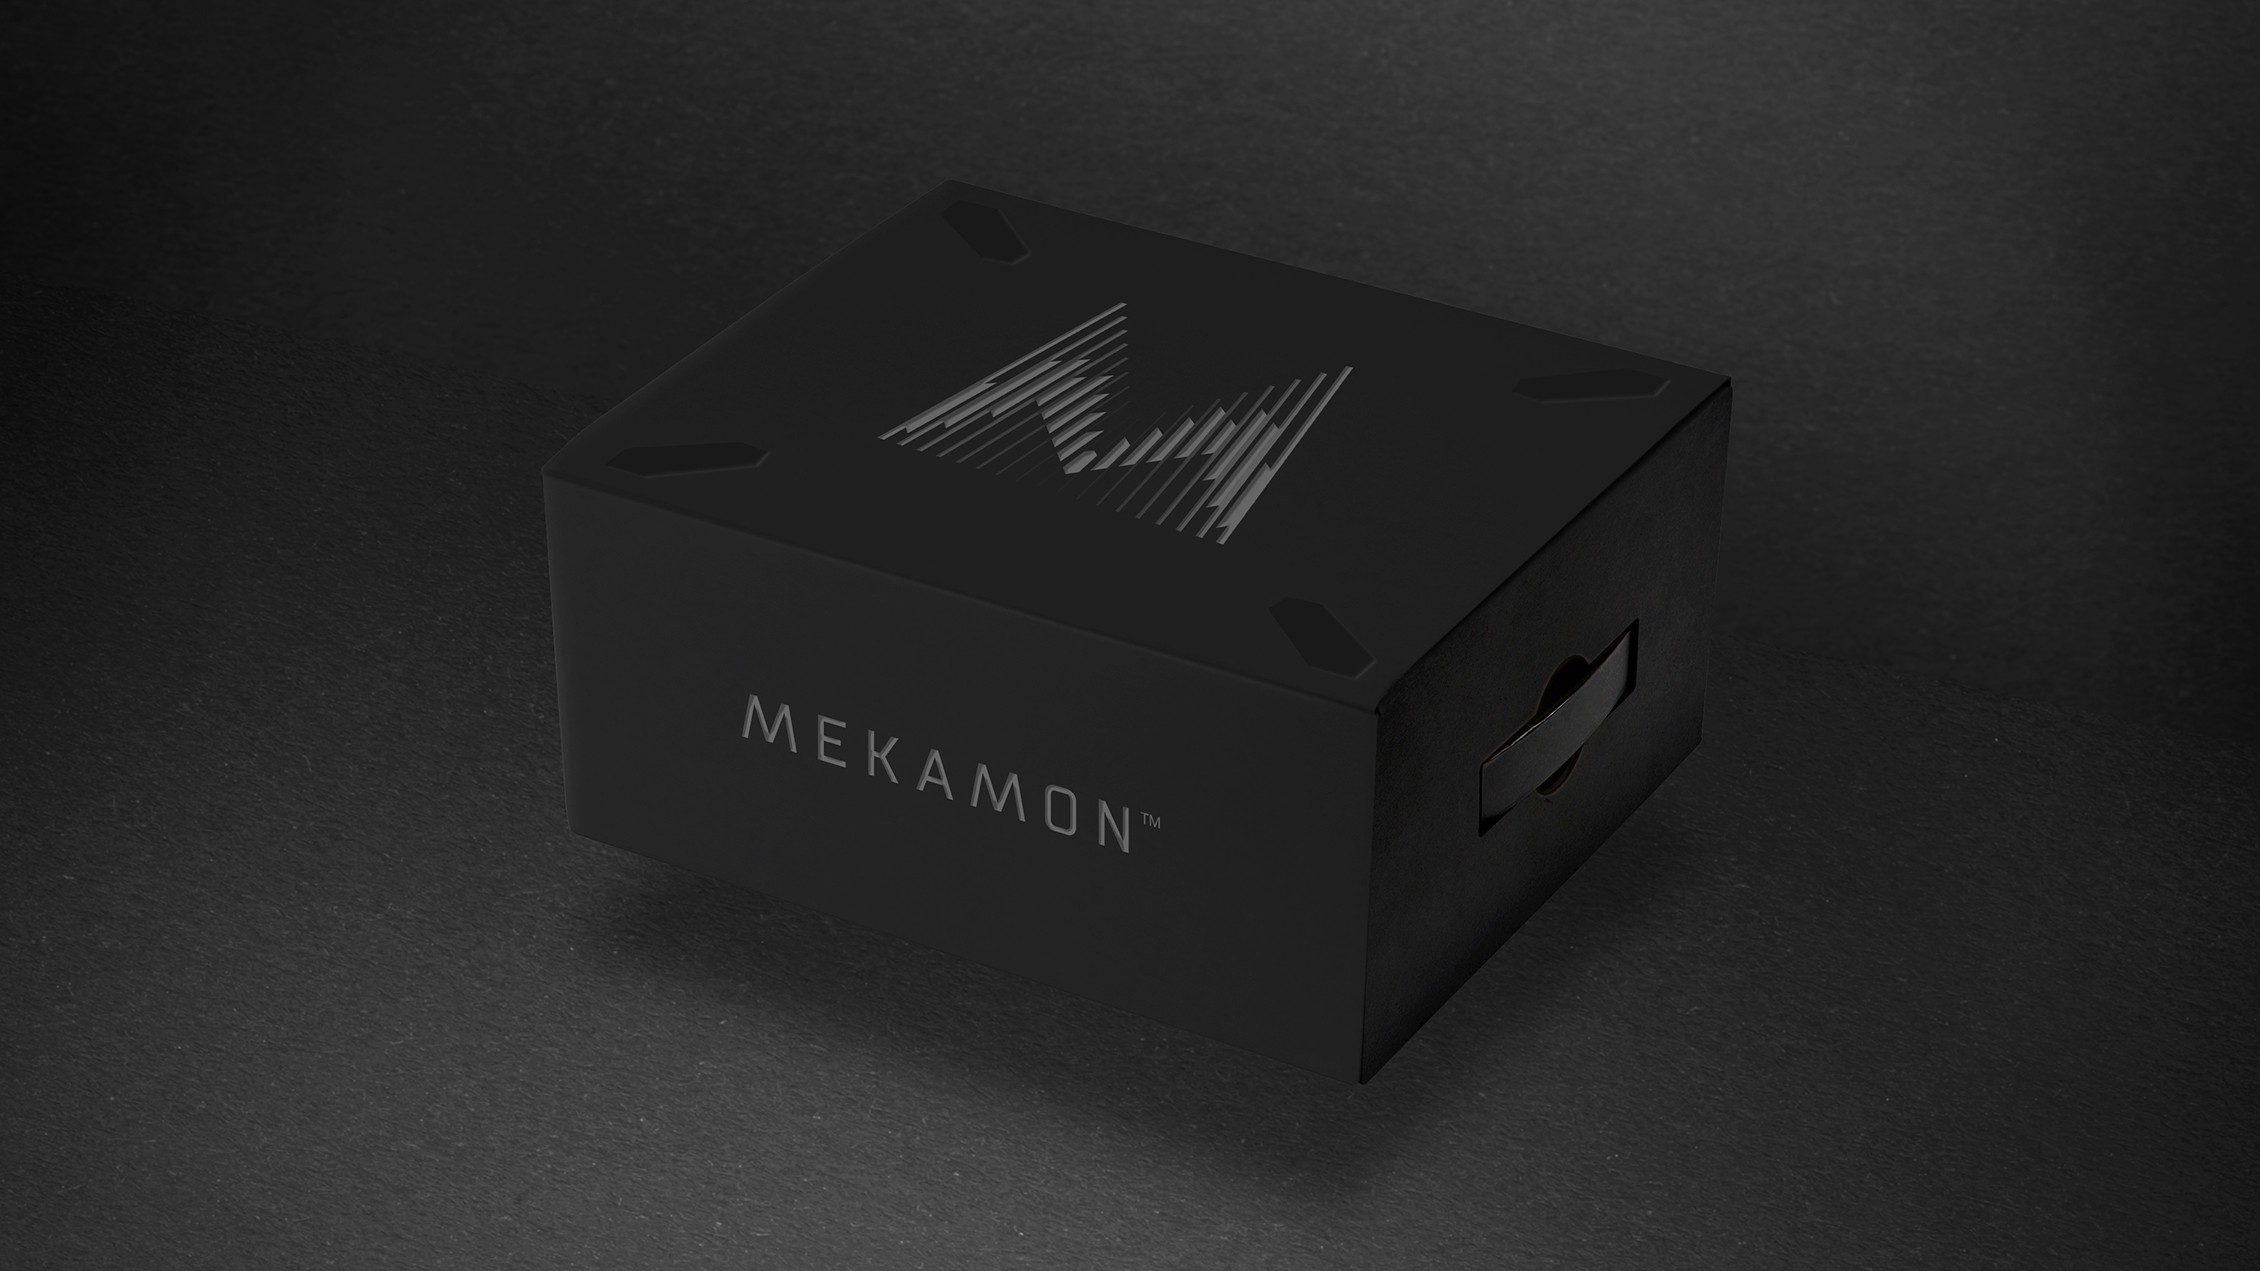 Mekamon_PackagingSleeveFront_r5v2.jpg